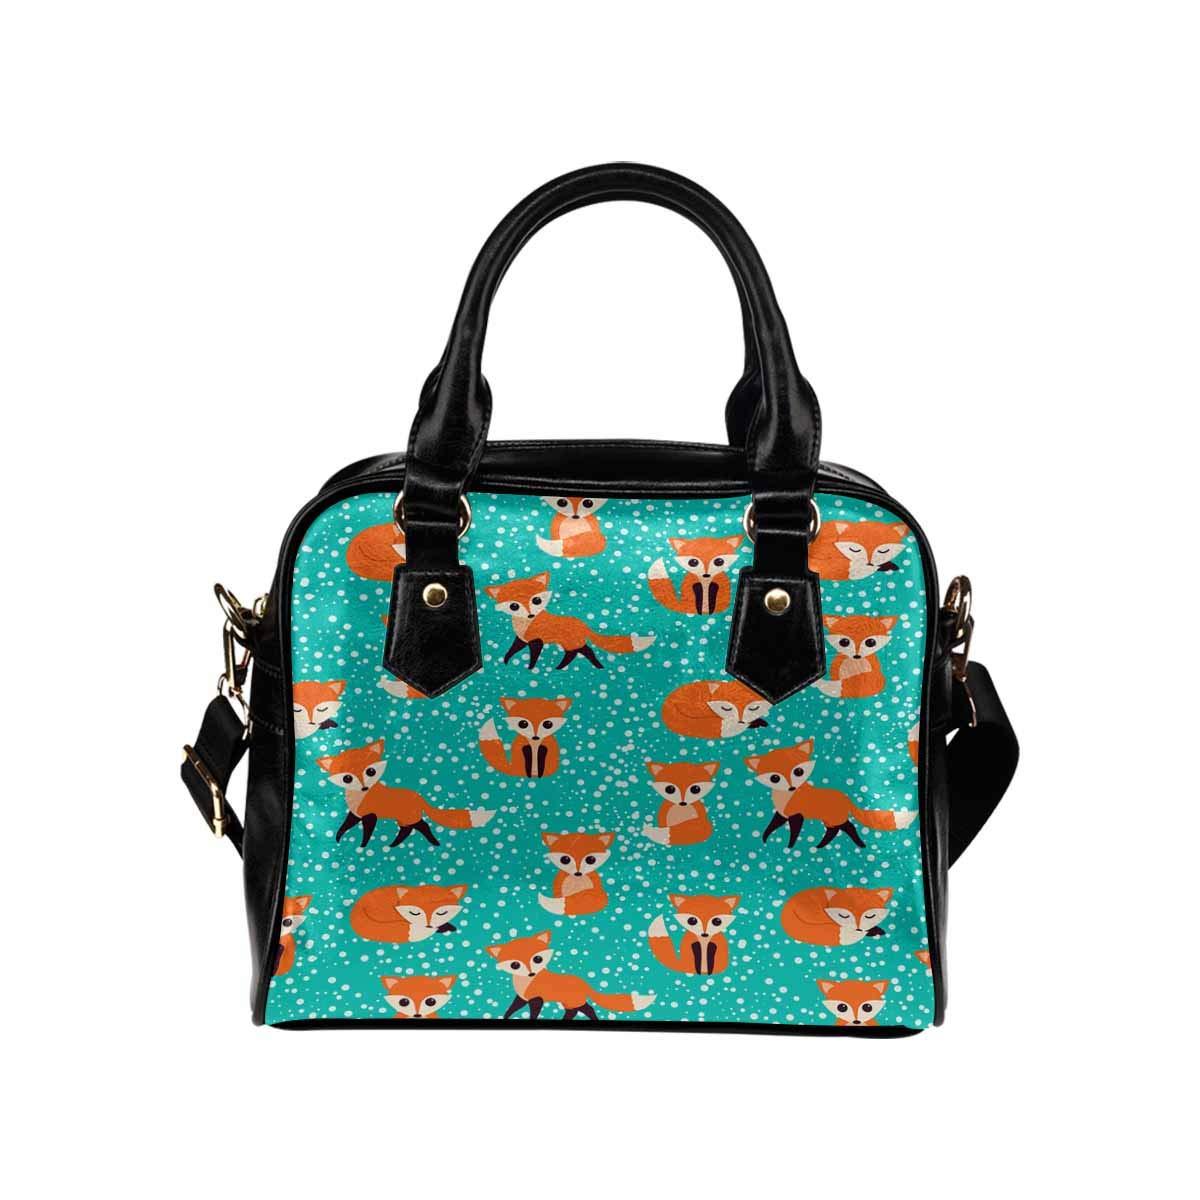 InterestPrint Crossbody Purse Bags for Women Shoulder Bag